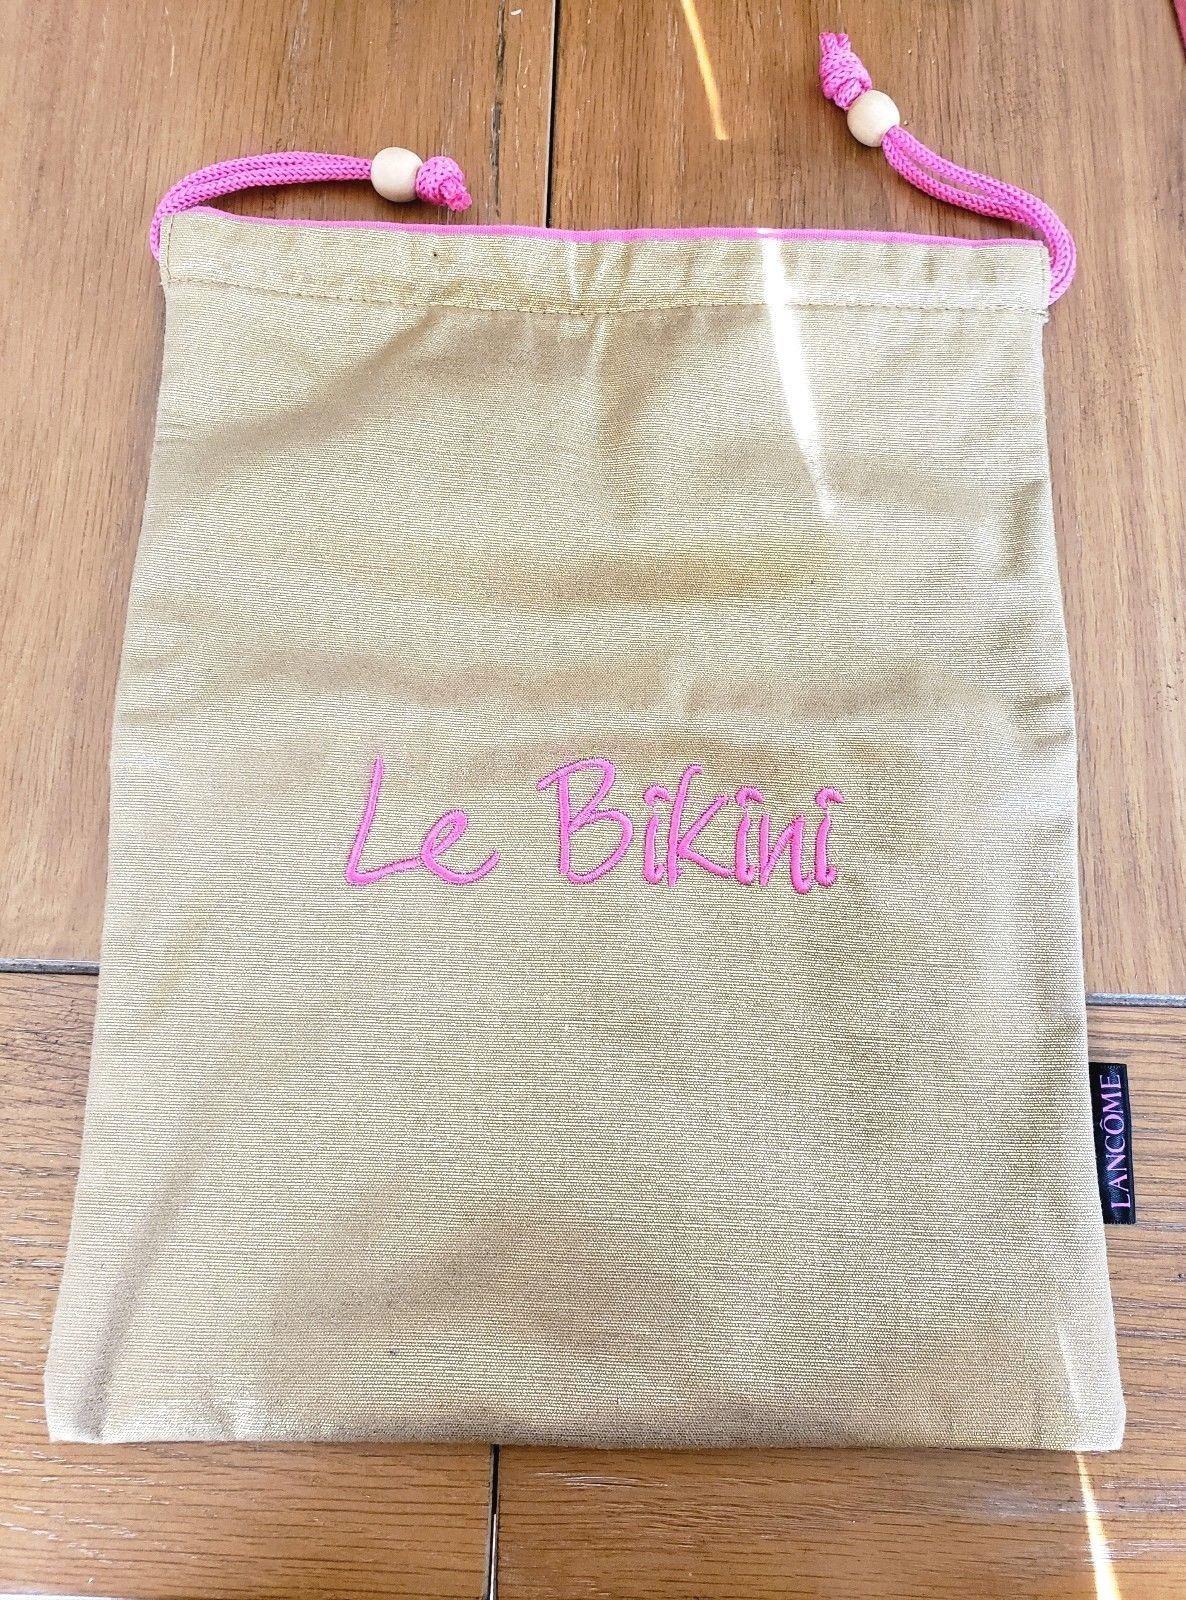 LANCOME Le Bikini Wet Bikini Gold W Pink Vinyl Lined Drawstring Bag. NWOT